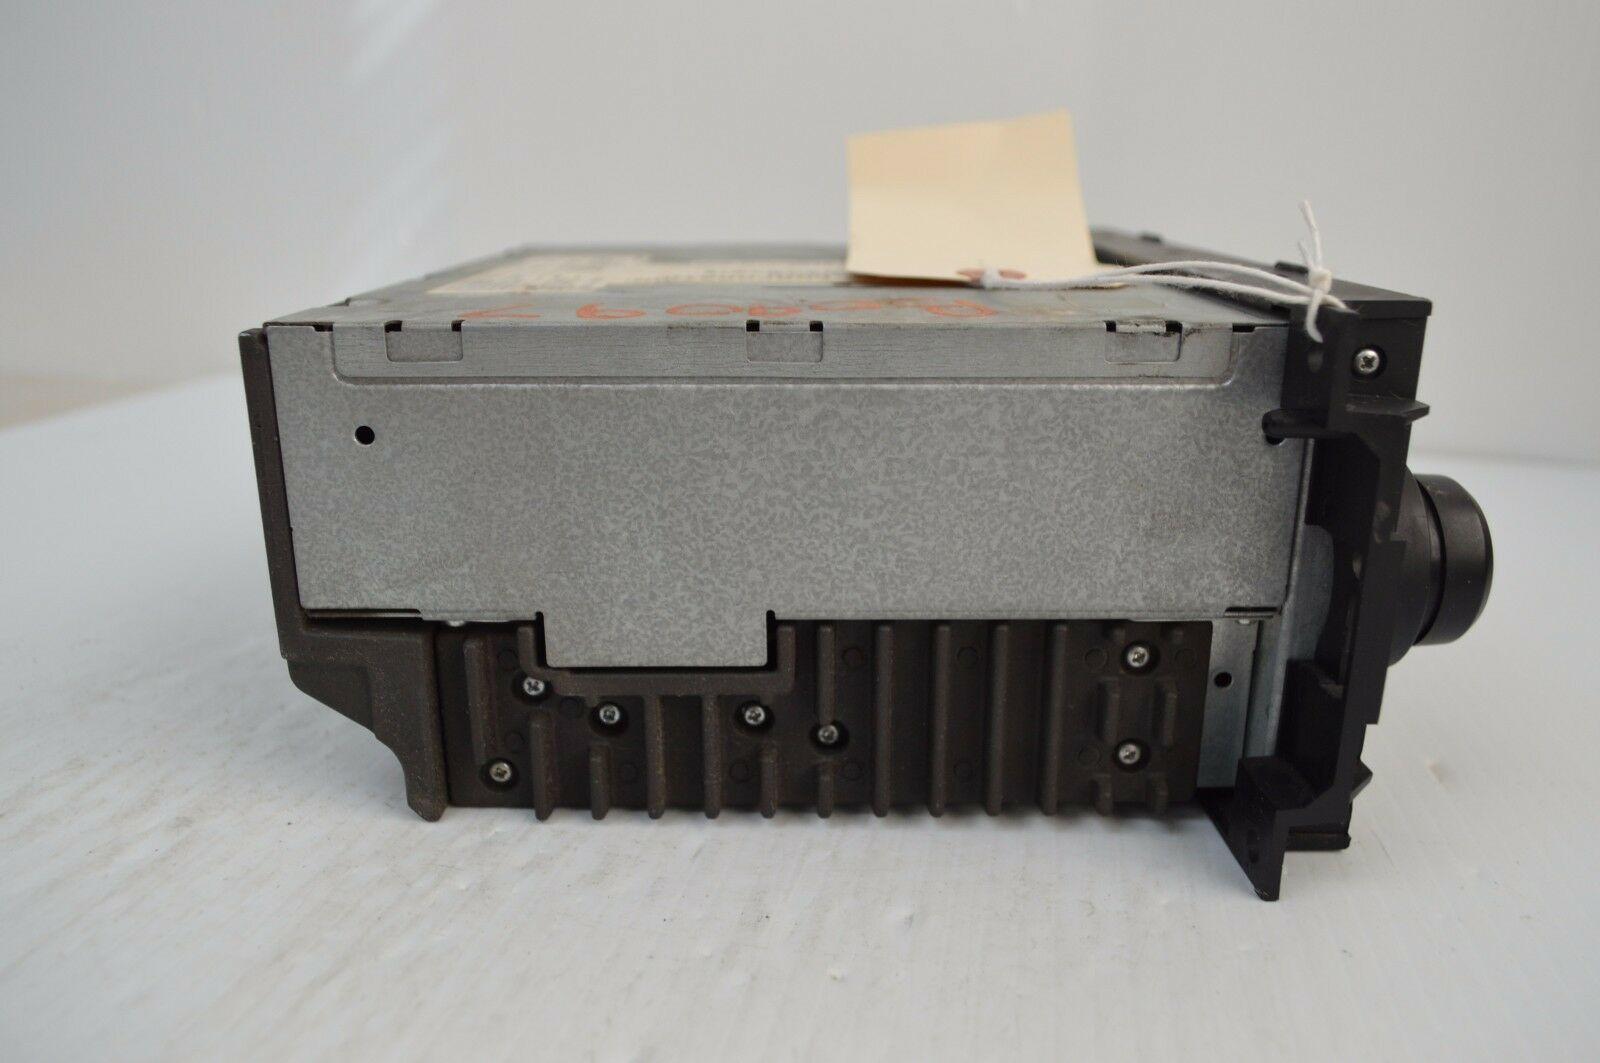 2005-2007 CHRYSLER DODGE RADIO 6 CD MP3 CASSETTE PLAYER TESTD 5091523AL AA36#016 image 3